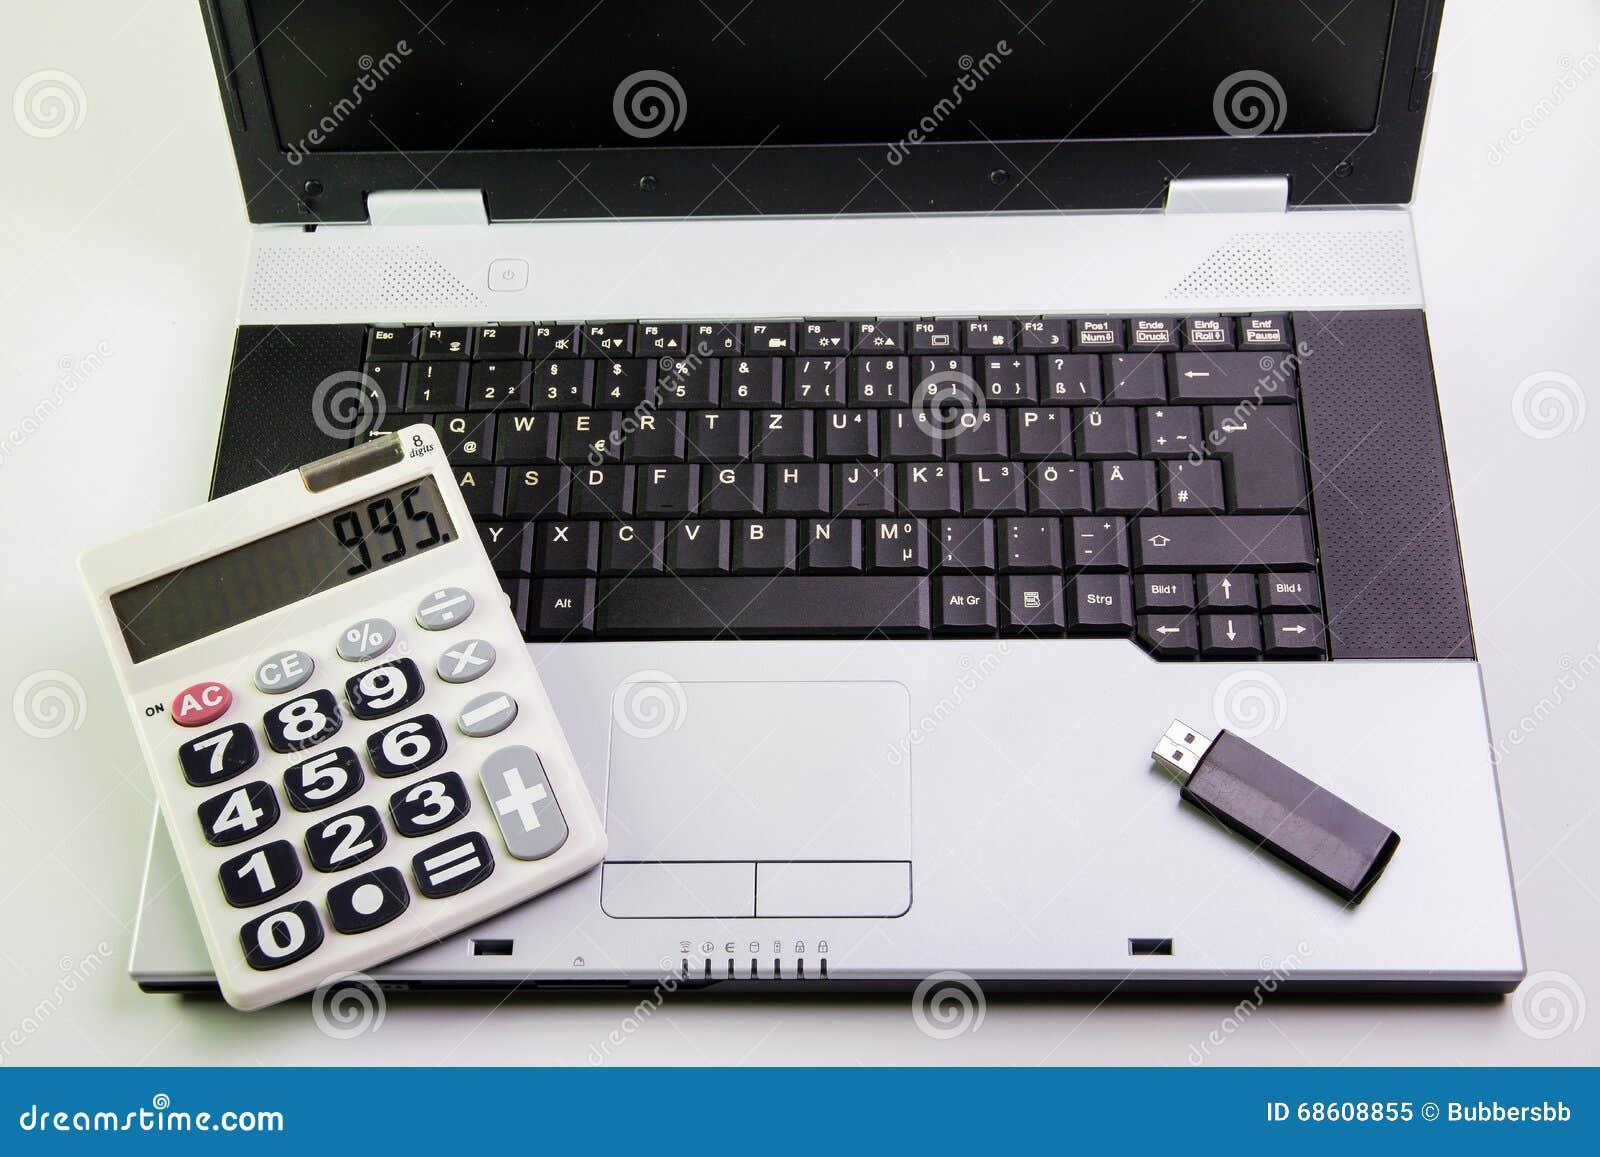 Notebook computer on the desk.Calculators,USB flash drive stick